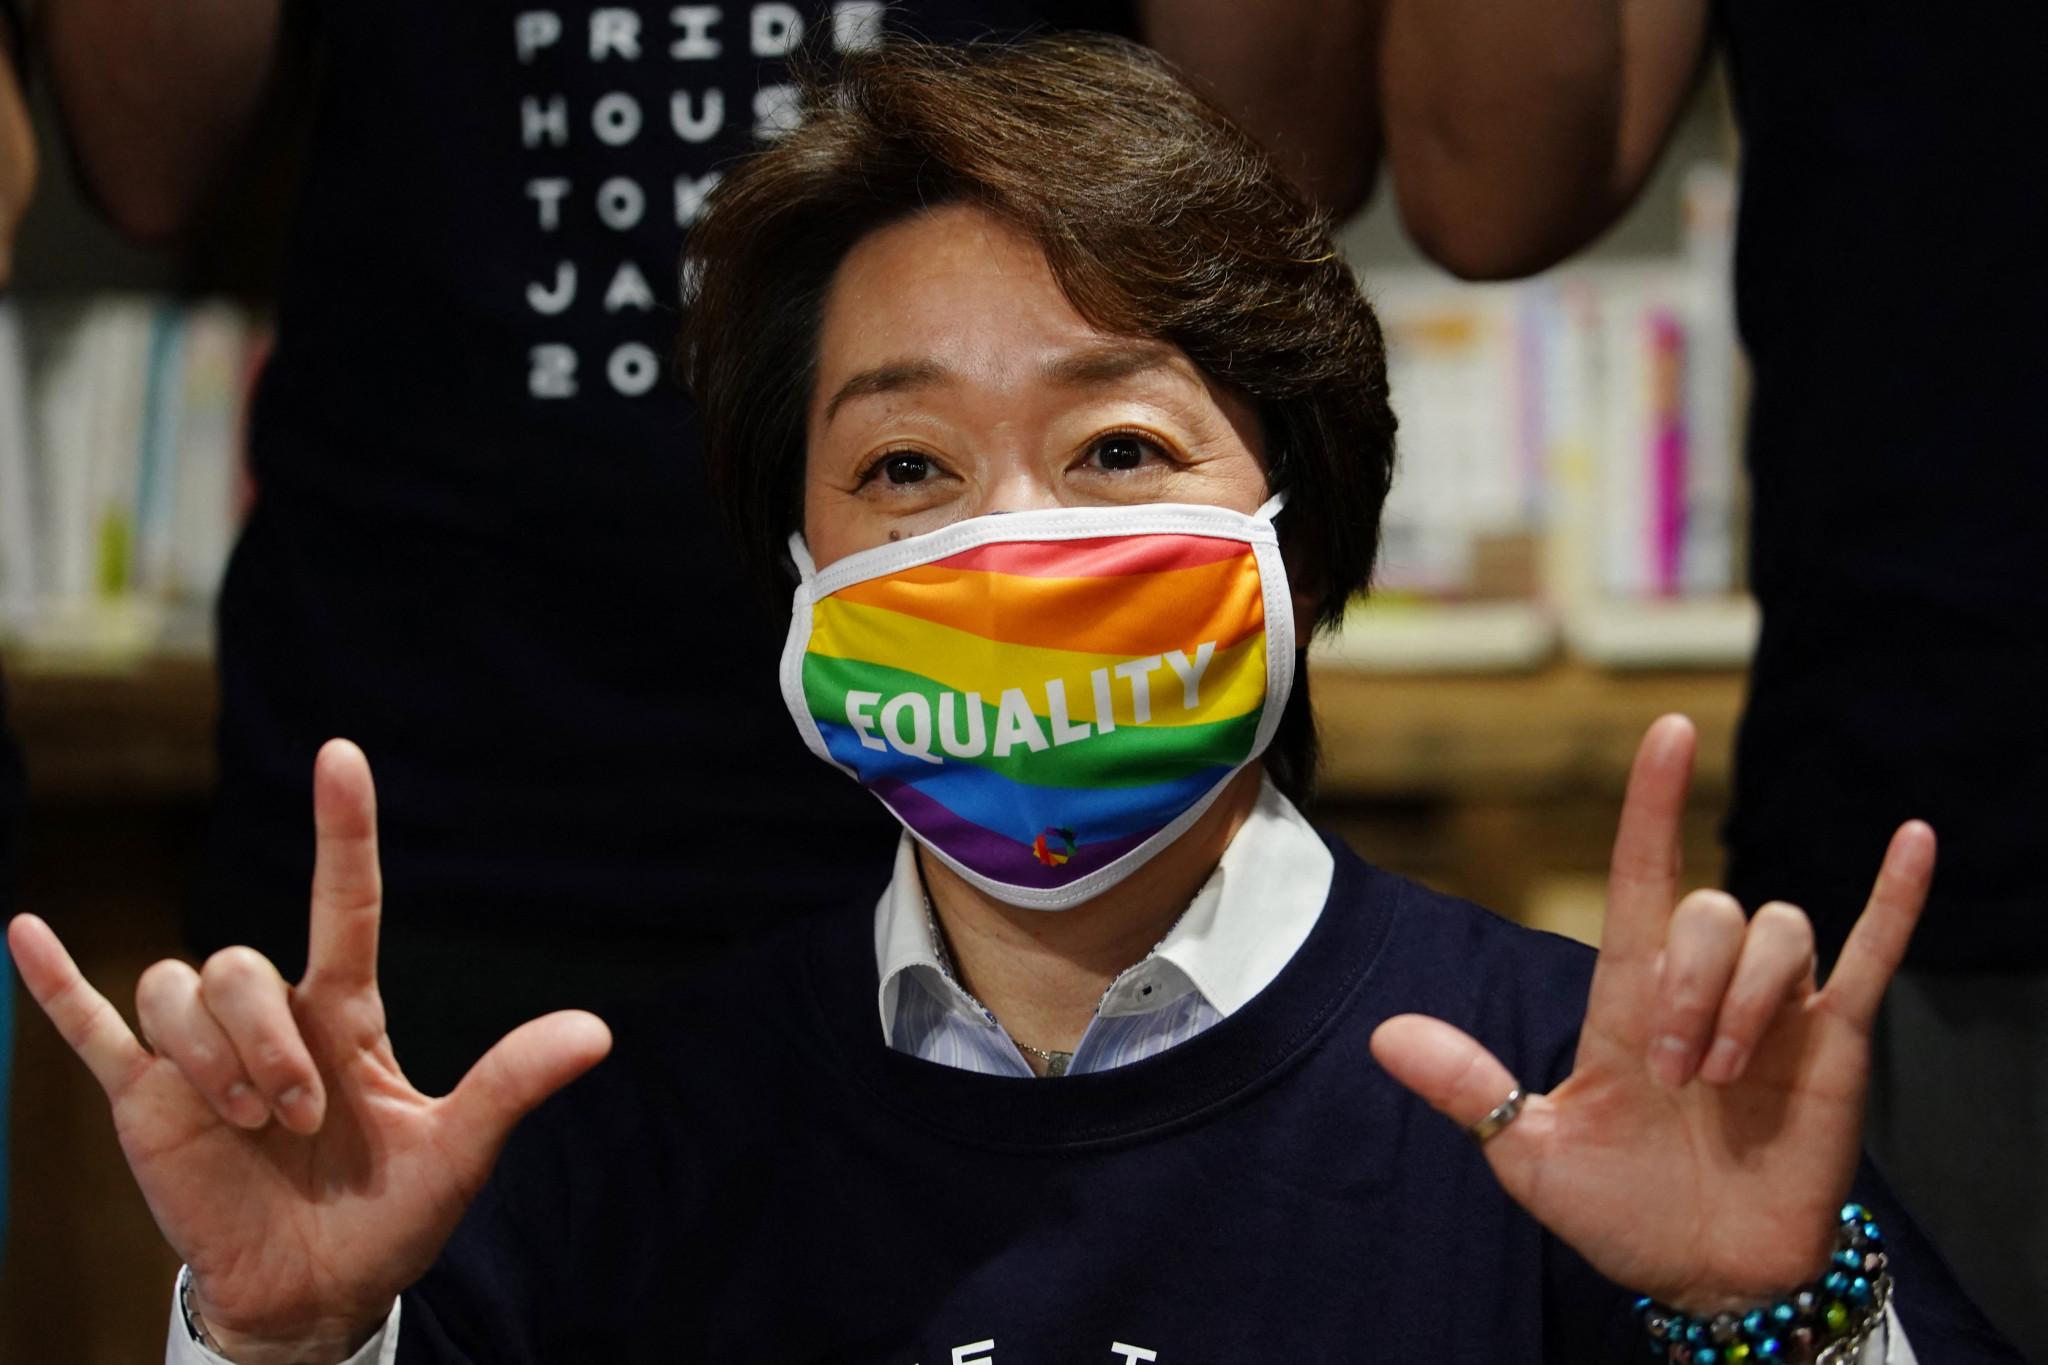 Tokyo 2020 President Hashimoto visits Pride House Tokyo amid calls for equality legislation to form Olympic legacy